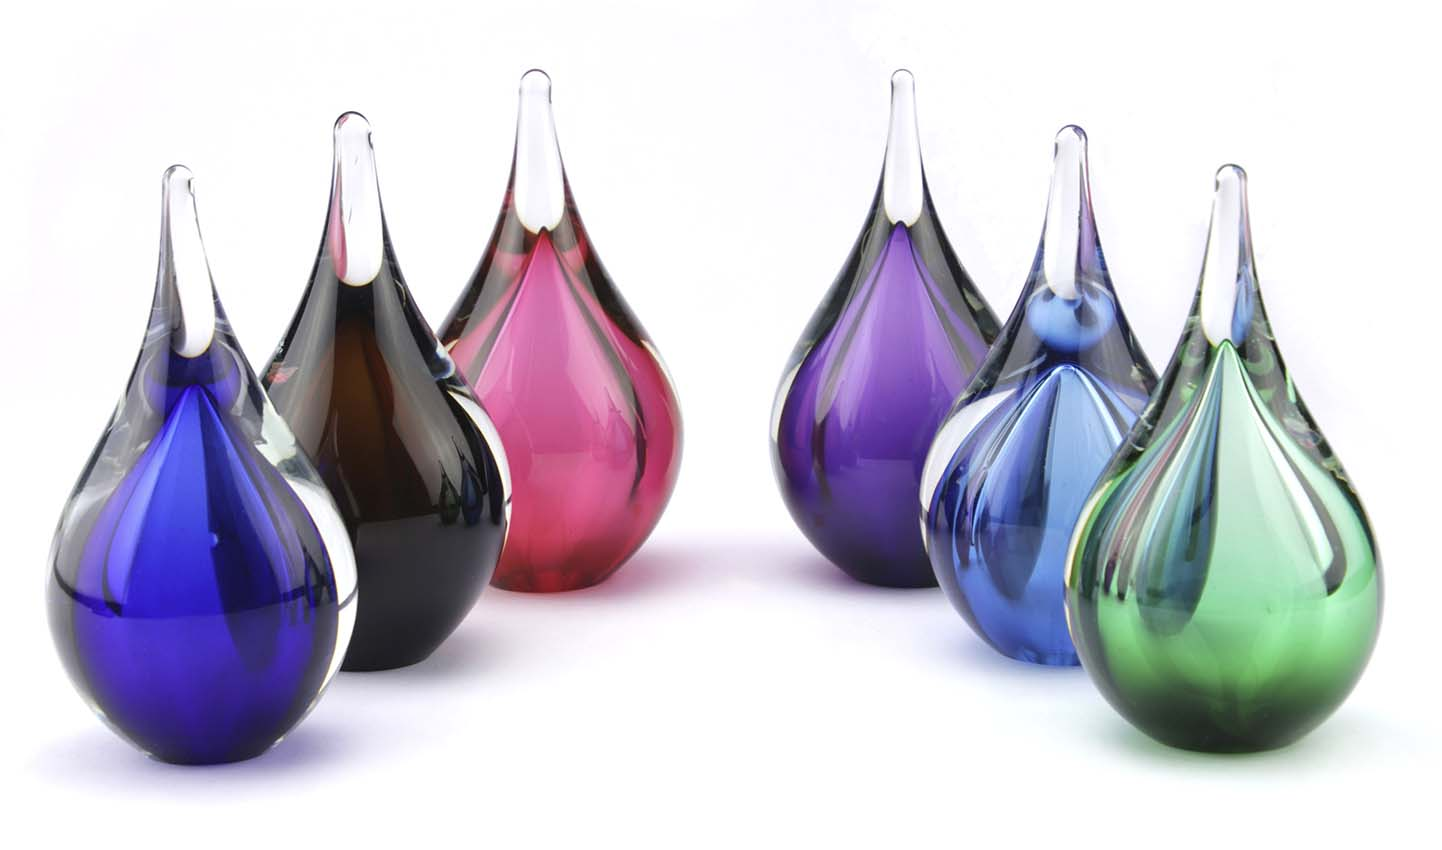 Kristalglazen 3D Mini Traan Dierenurn Roze-Blauw (0.05 liter)